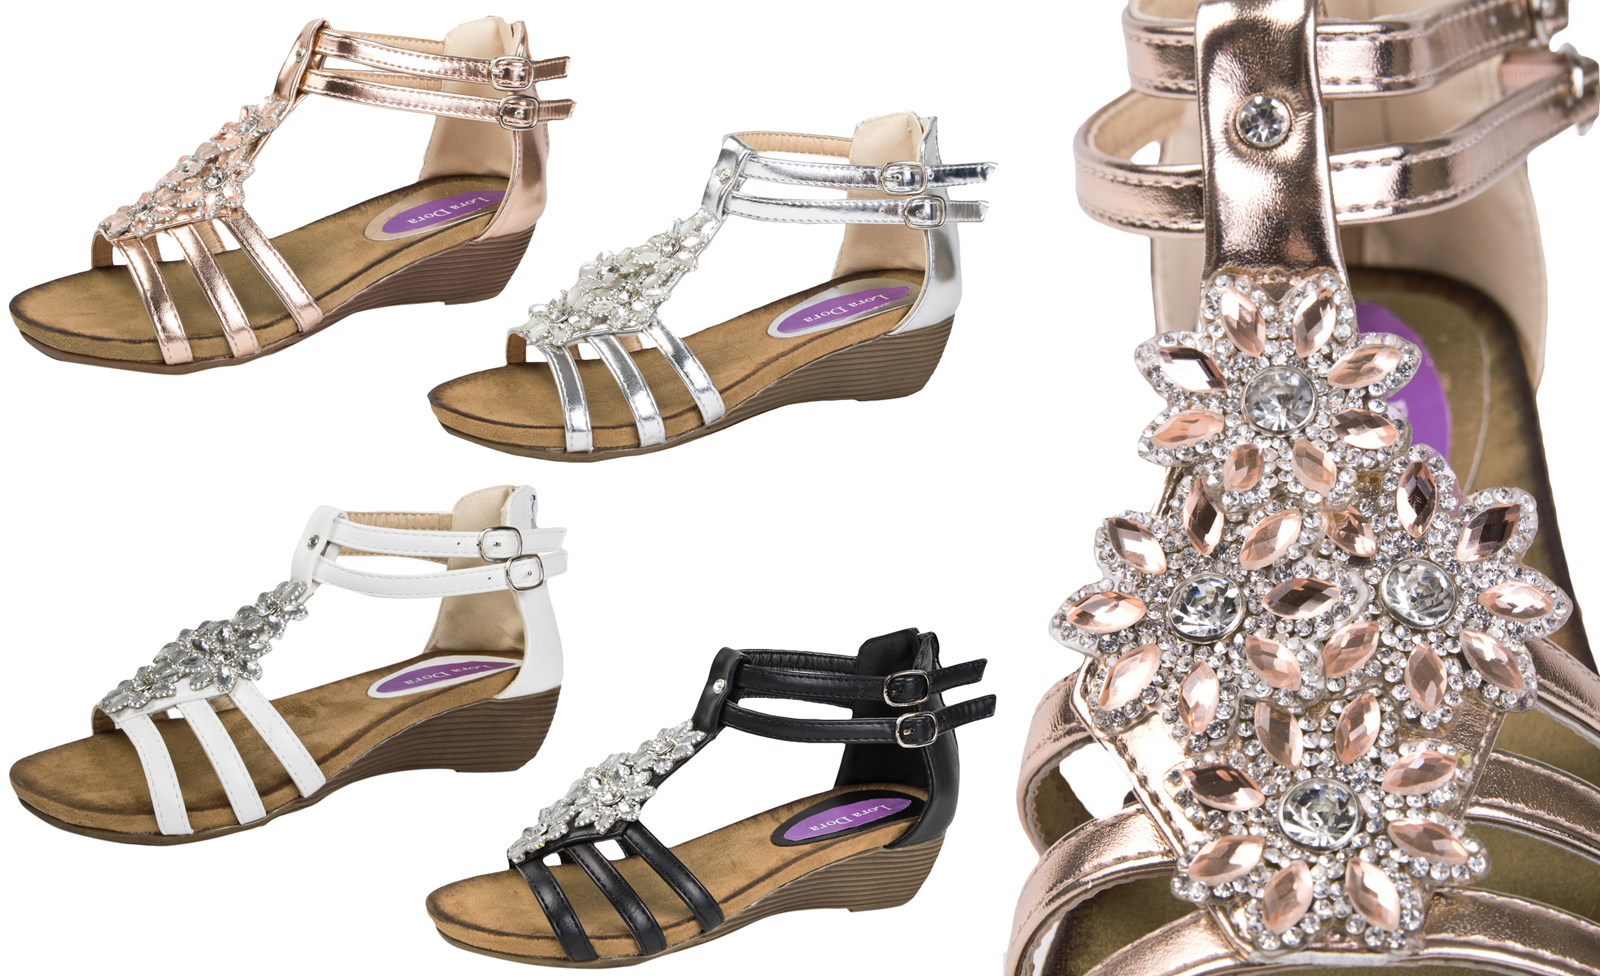 bca306968a4 Details about Womens Diamante Summer Sandals 3D Flower Low Wedge Heels  T-bar Shoes Ladies Size